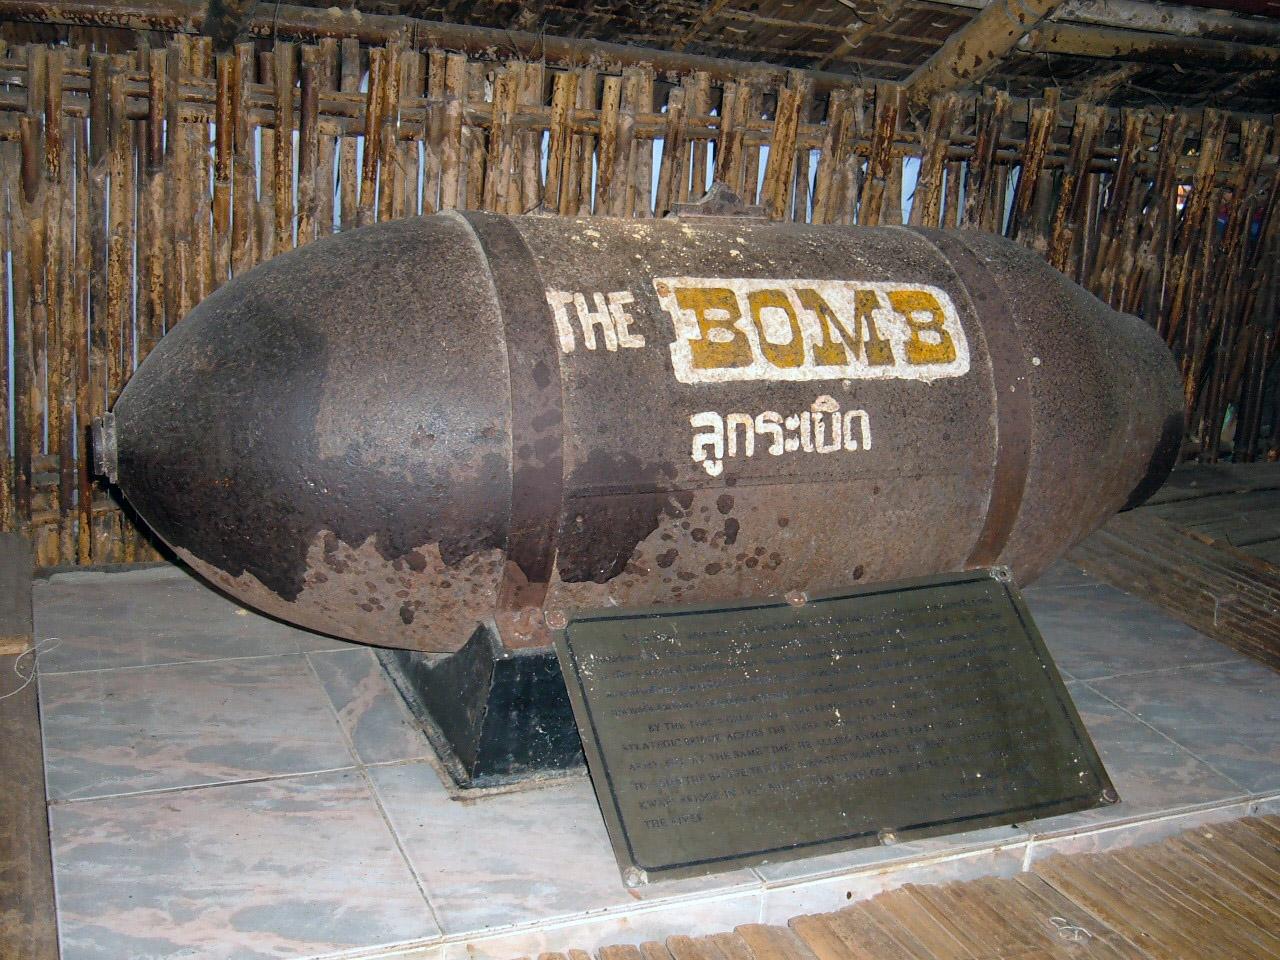 File:JEATH Museum the Bomb.JPG - Wikimedia Commons